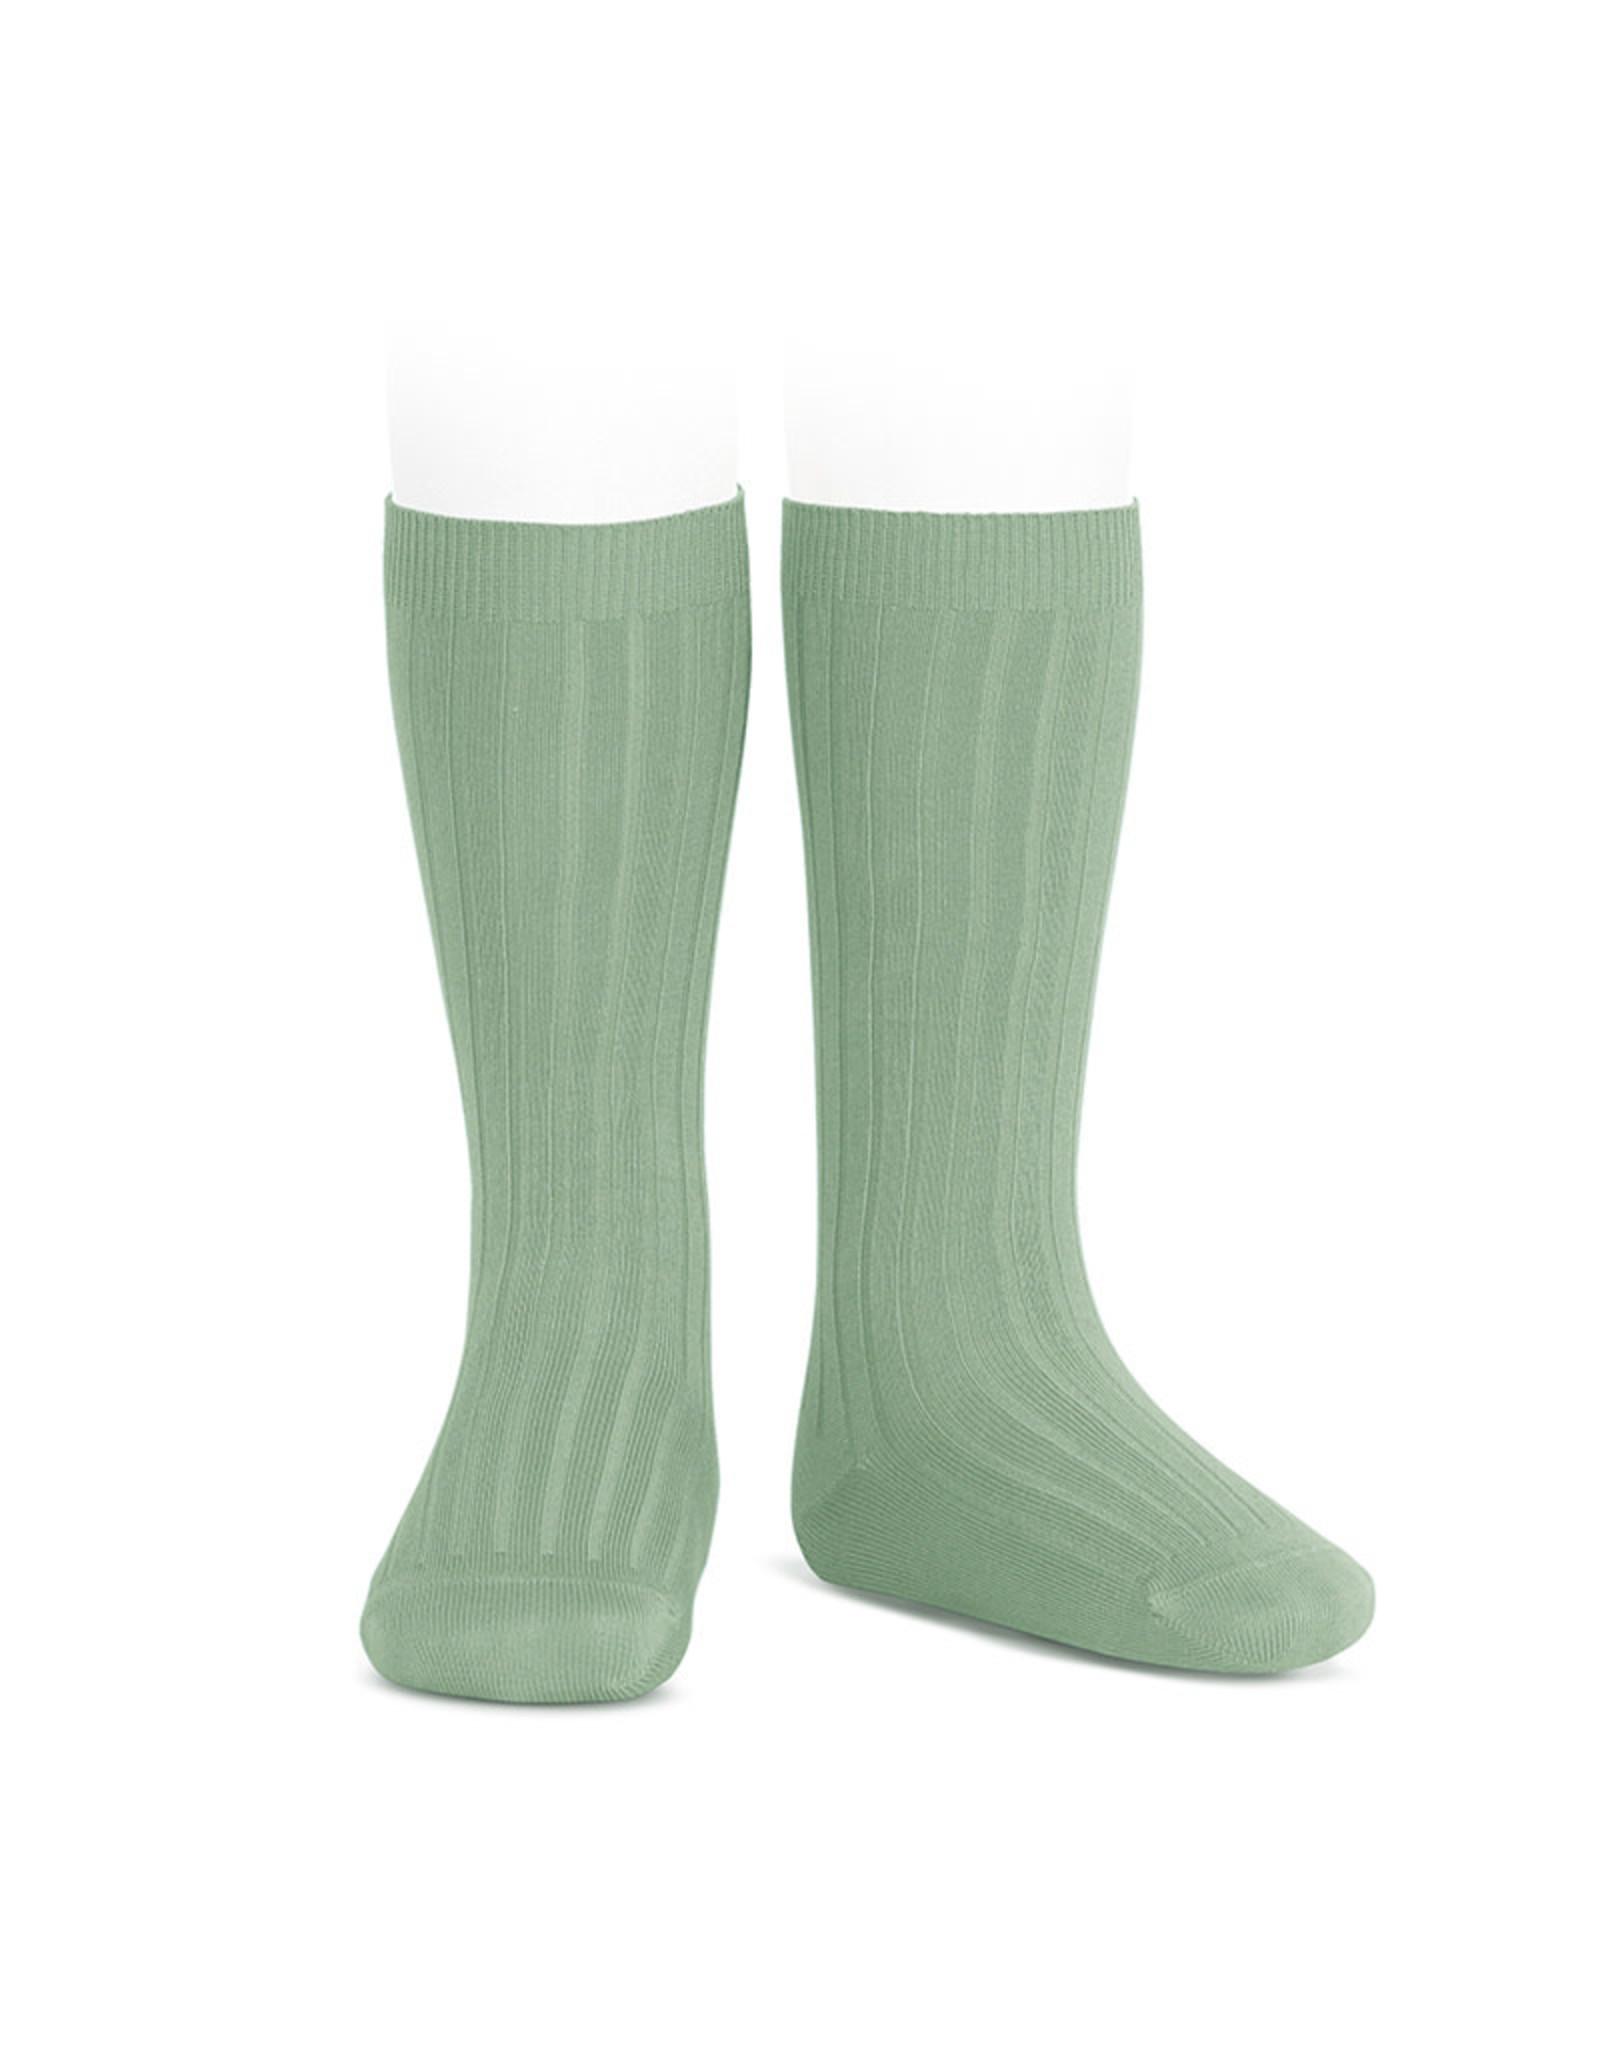 CONDOR Sage Rib Knee High Socks